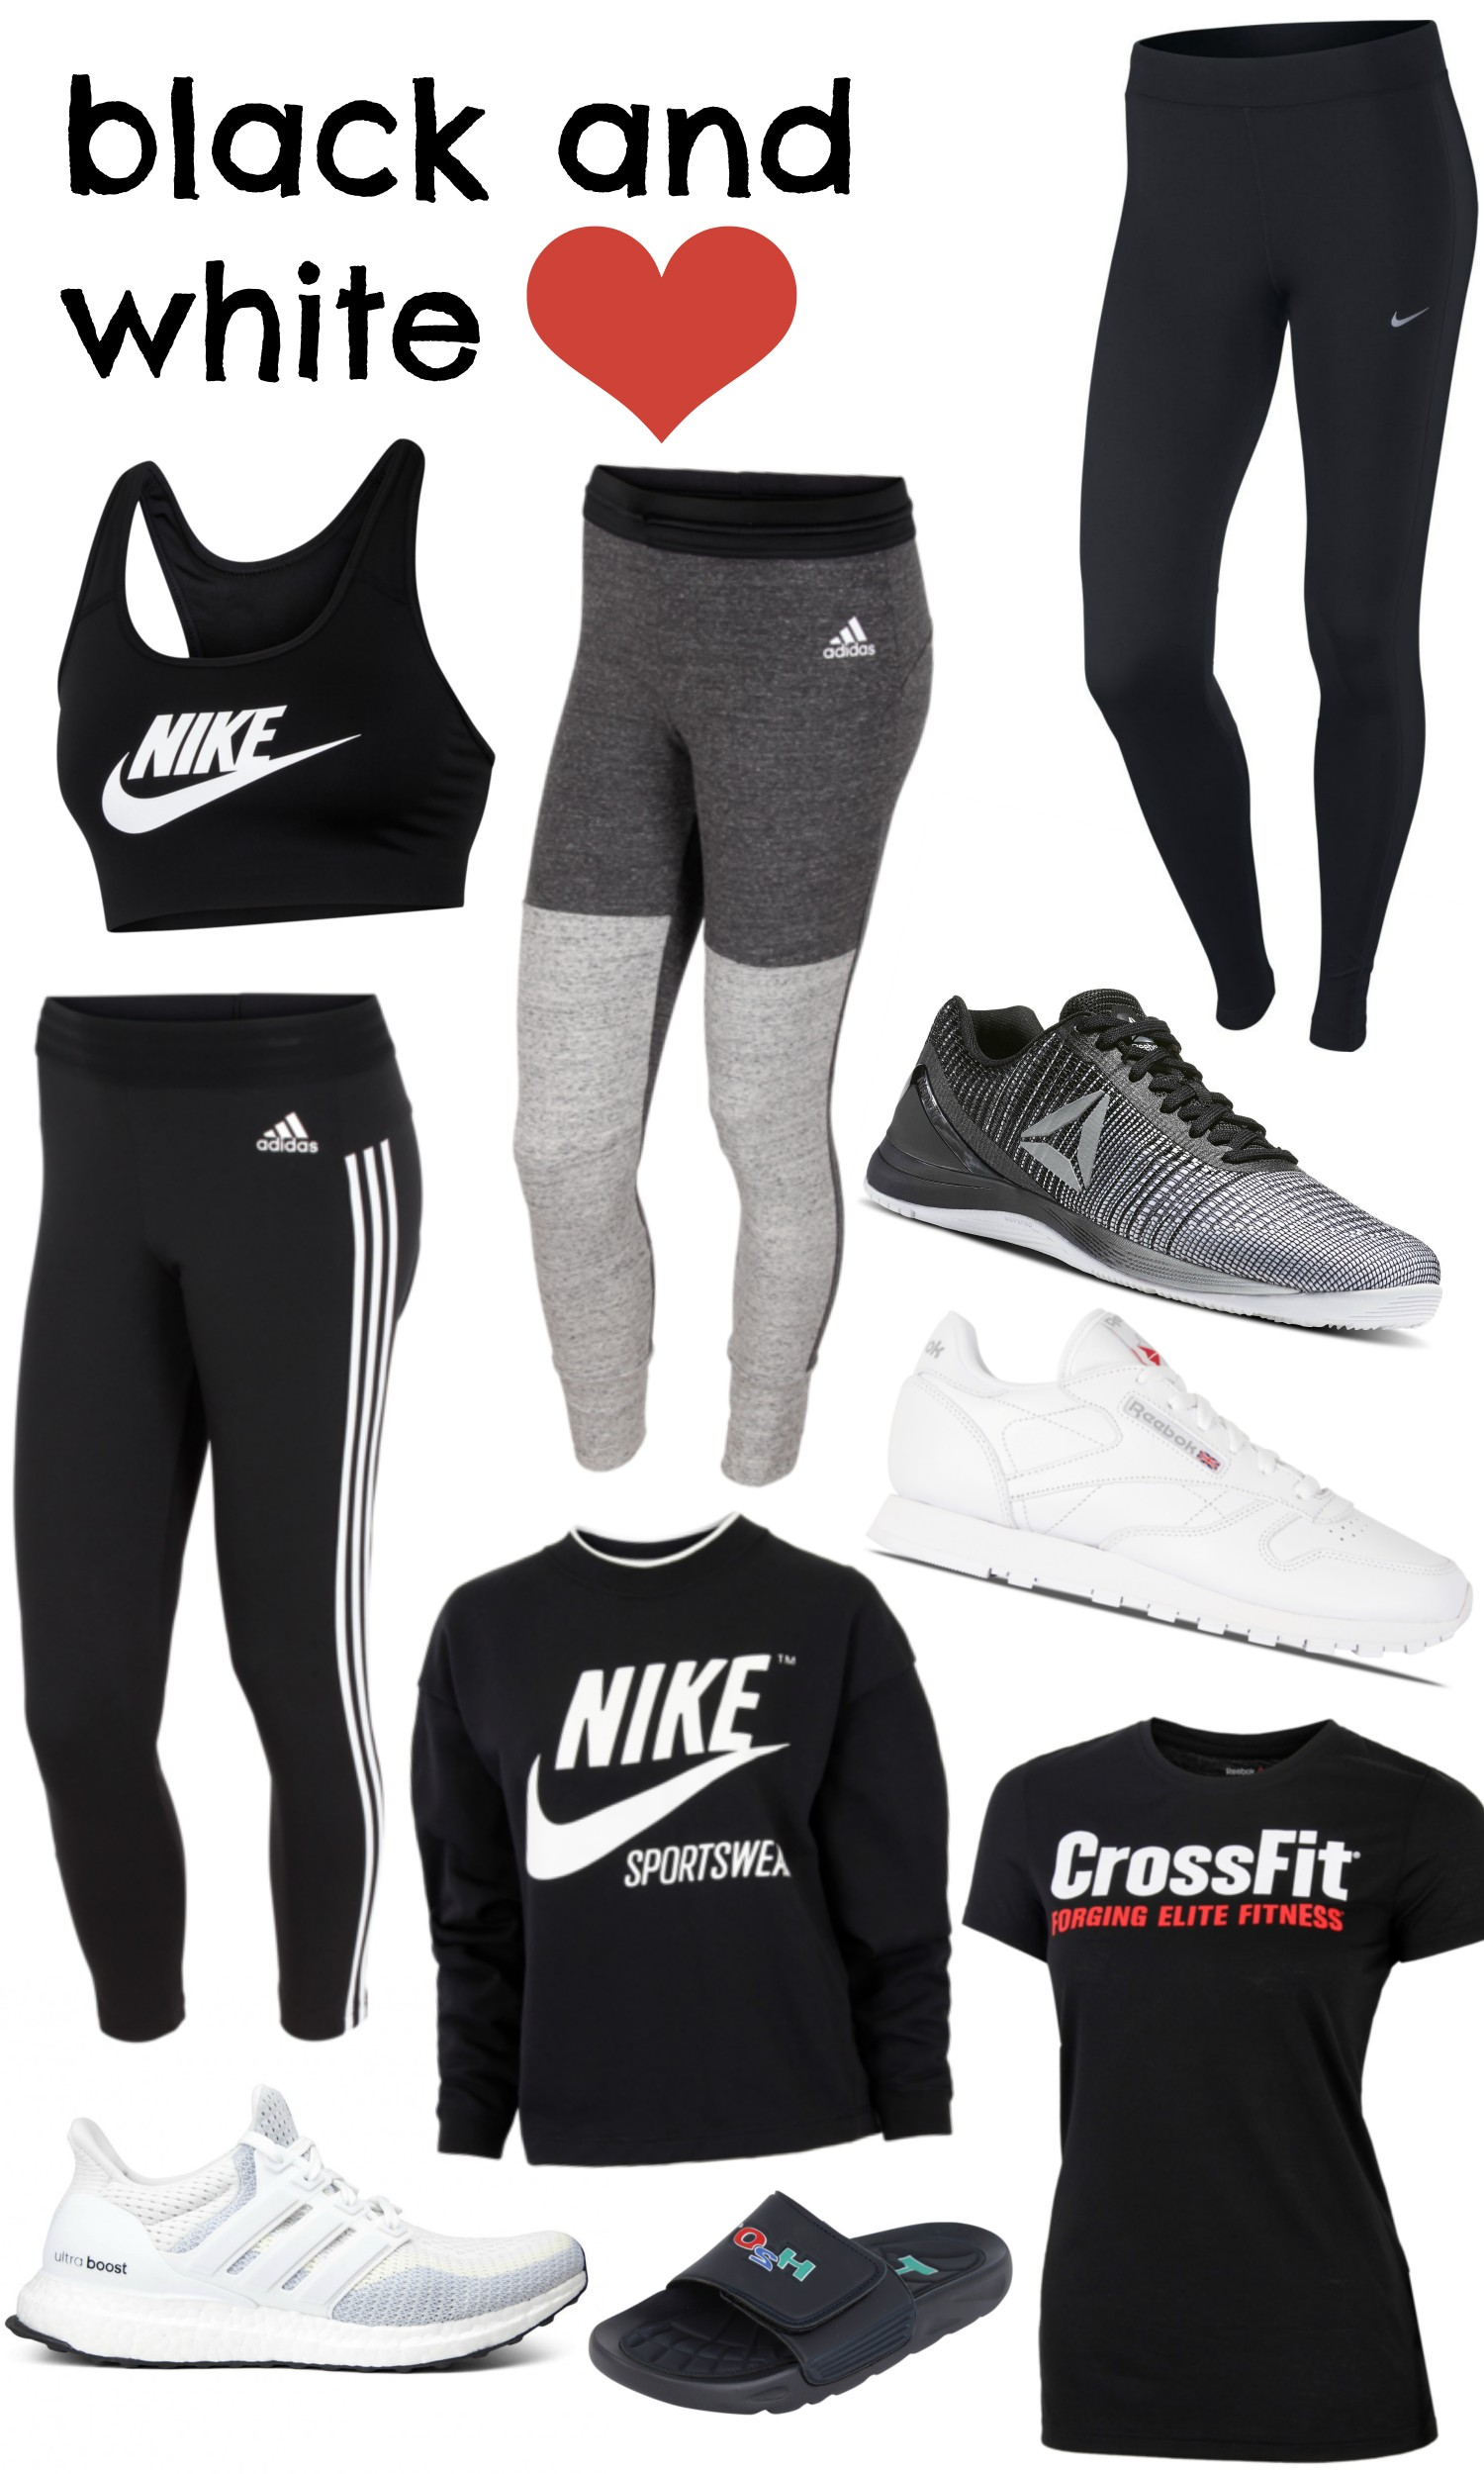 trinetheodora-sportmaster-udsalg-nike-adidas-reebok